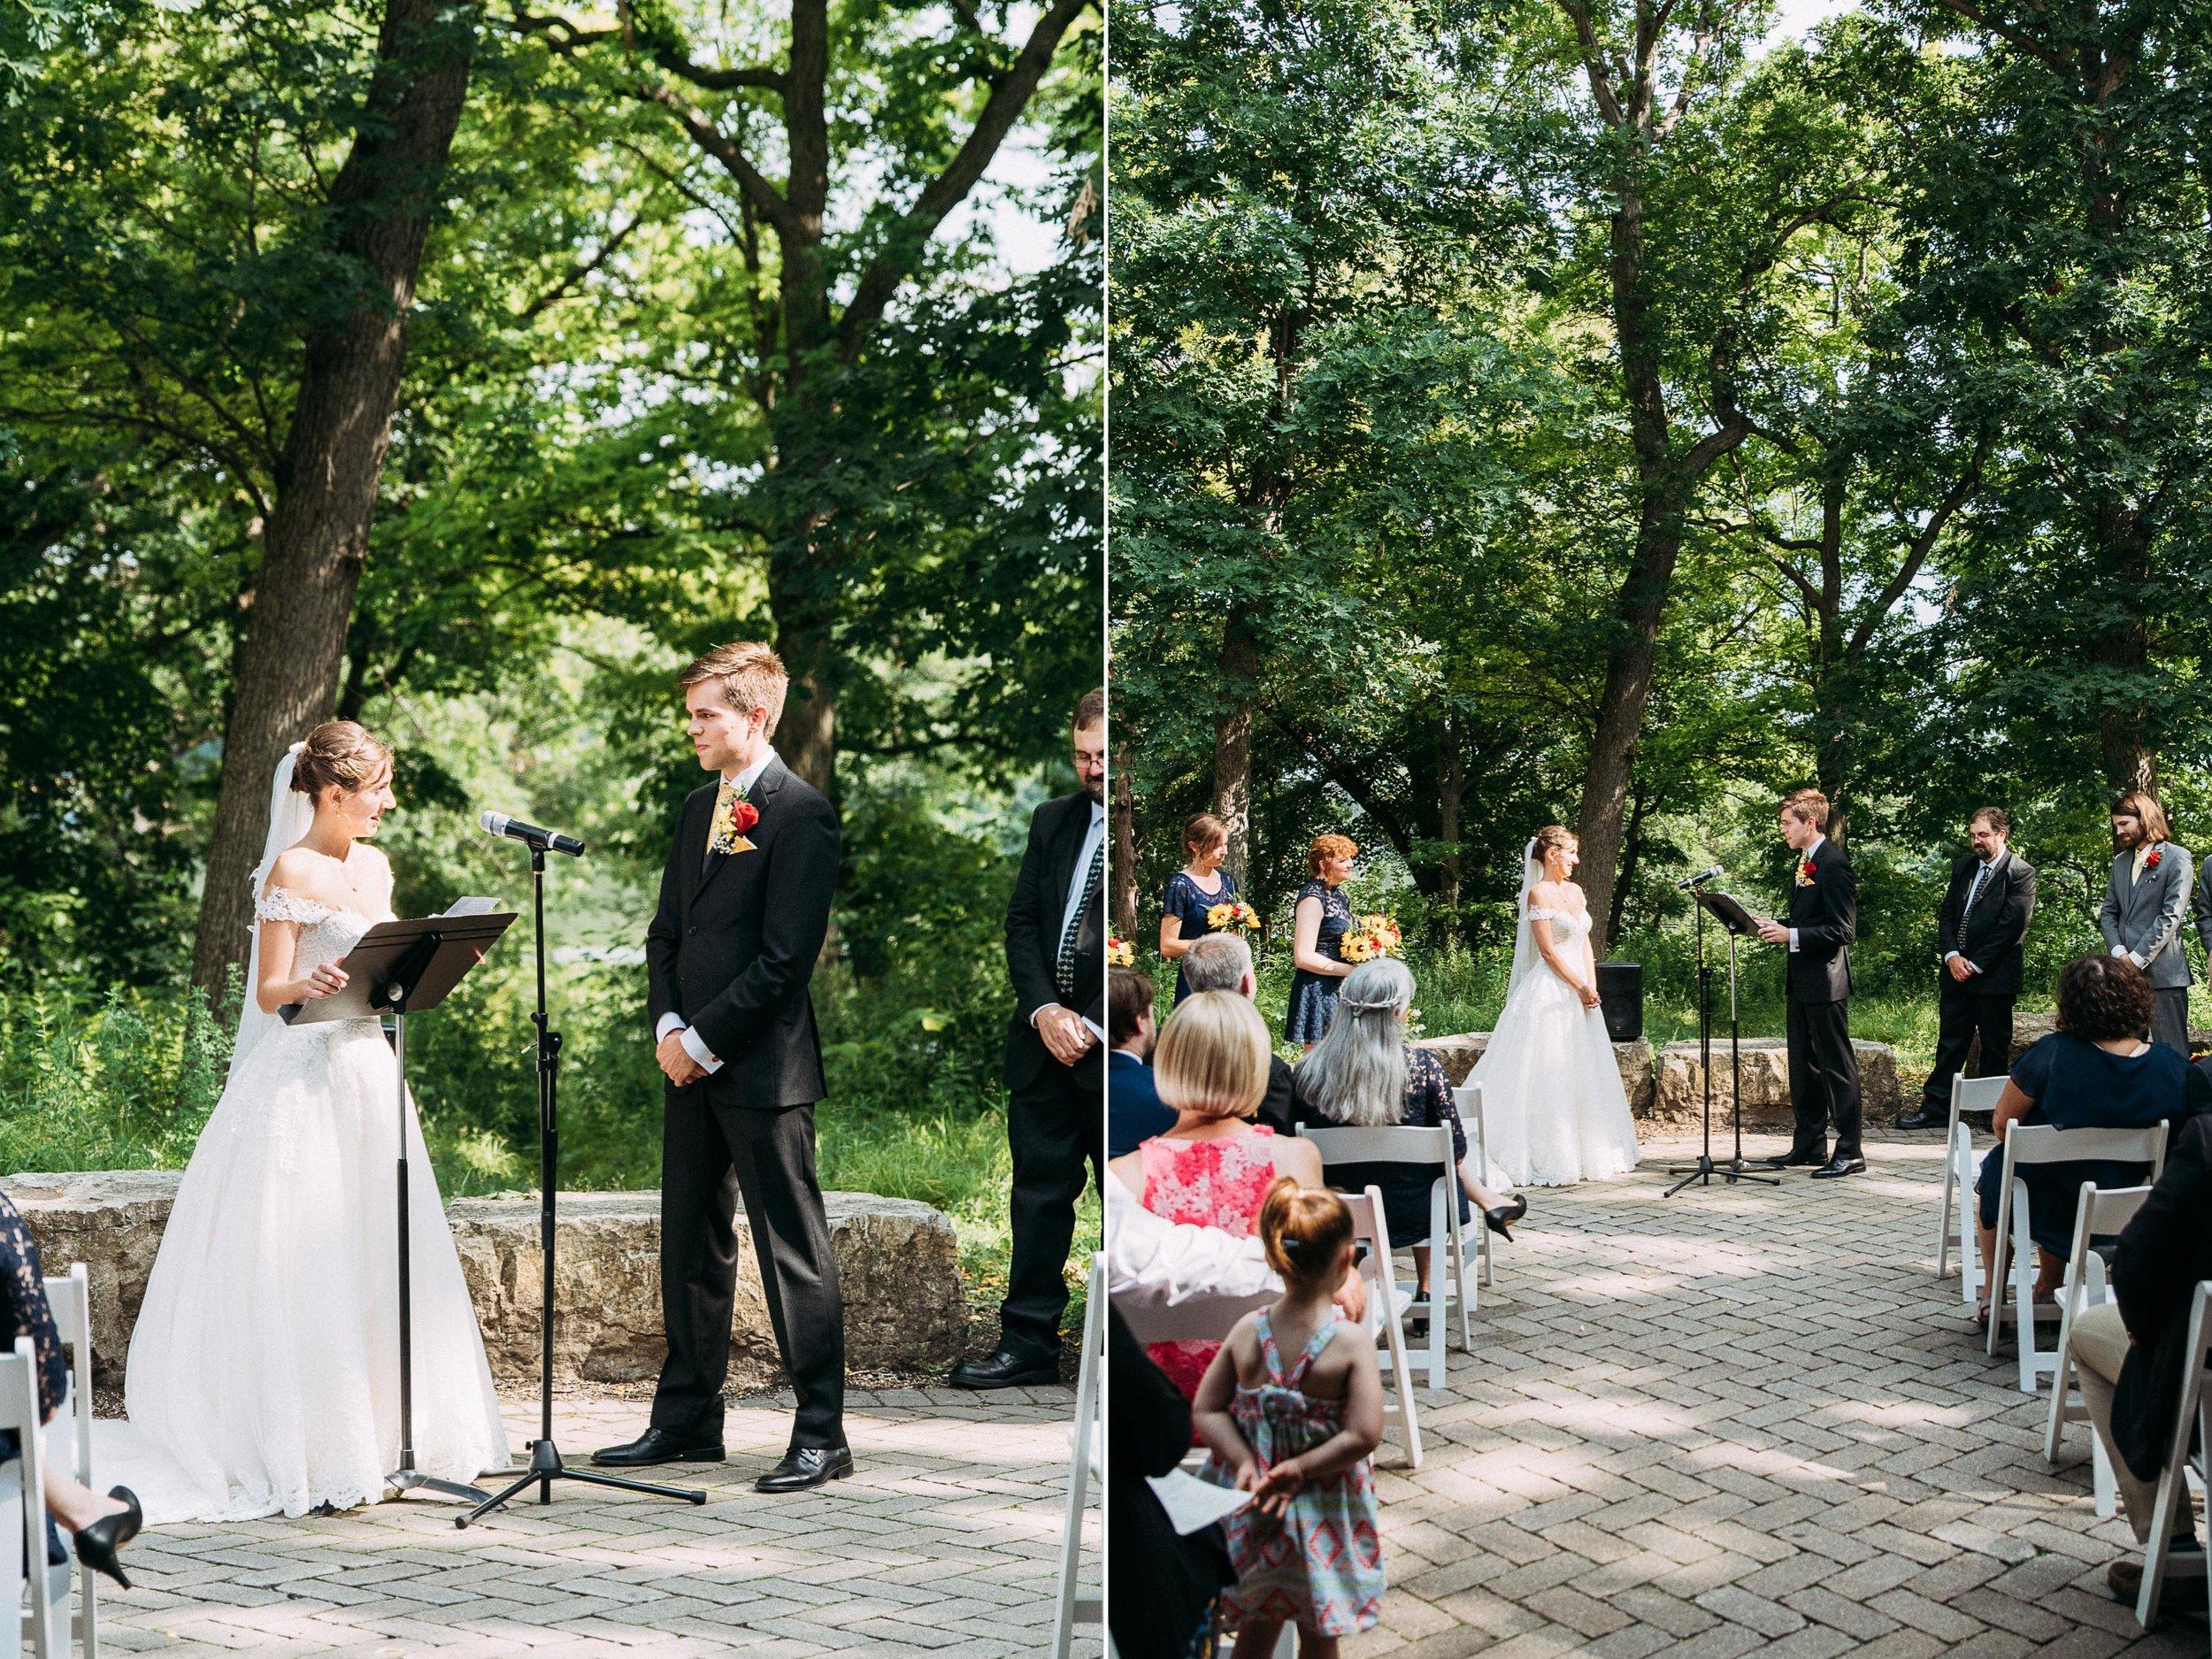 24-Liza_Chris_Minneapolis_Minnesota_Wedding.jpg